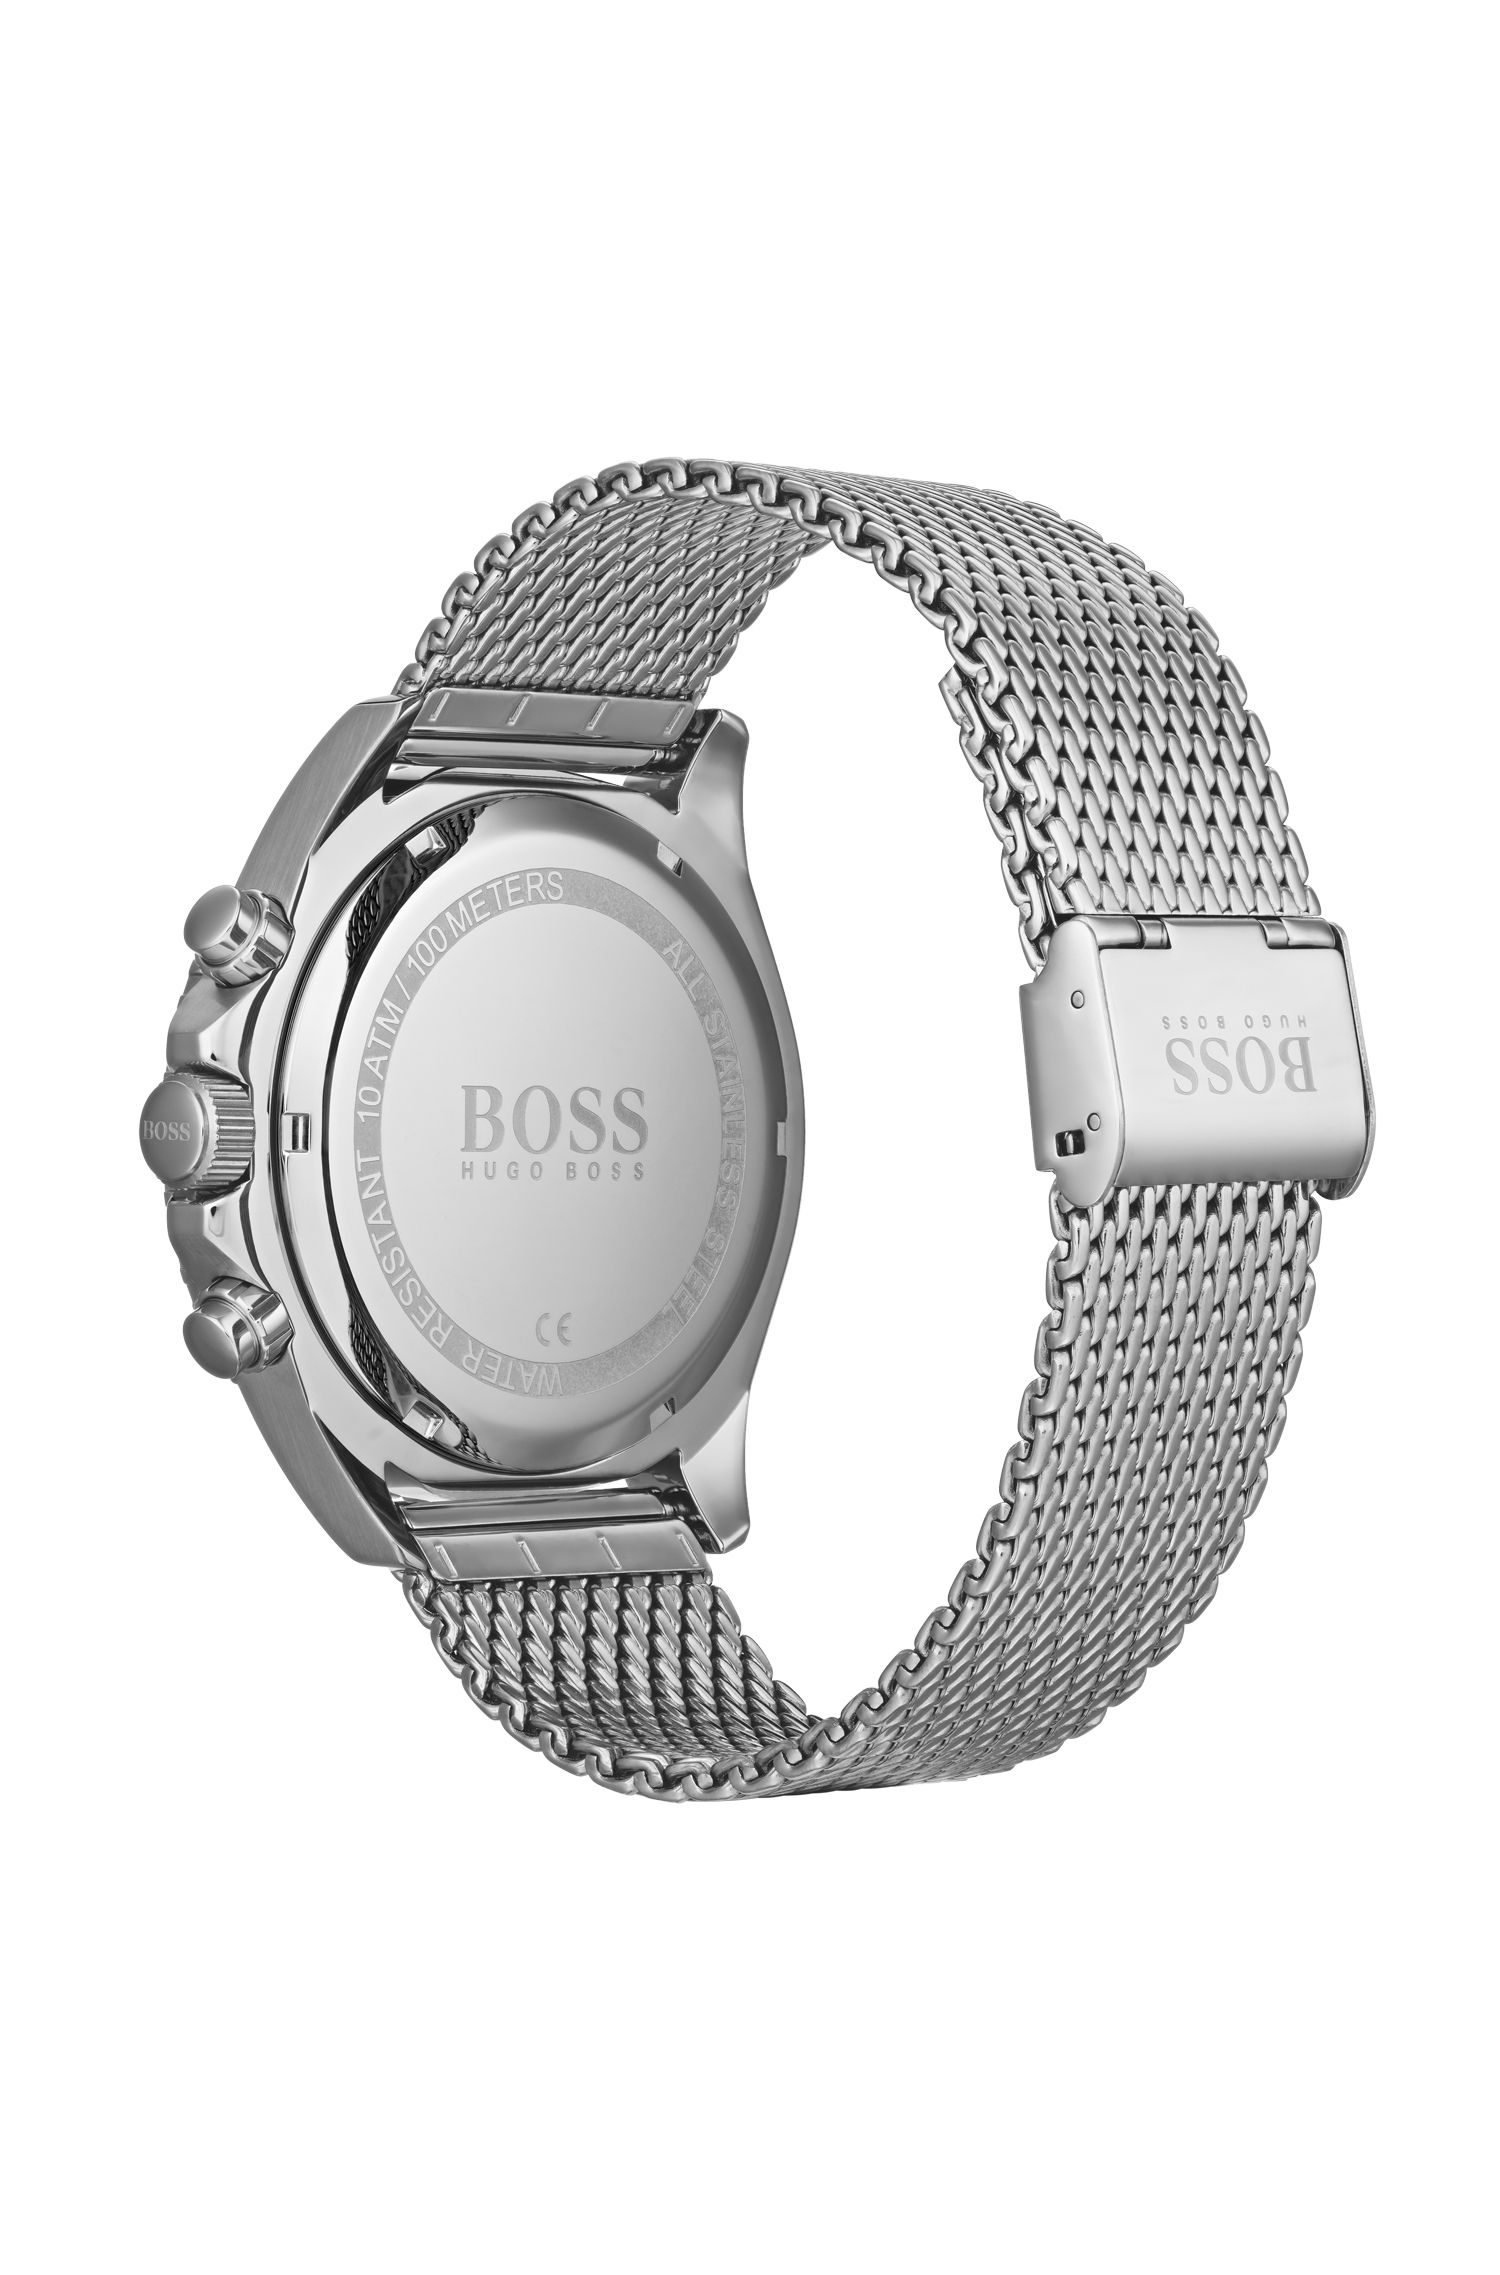 Reloj cronógrafo de acero inoxidable con bisel giratorio y pulsera de malla, Plata